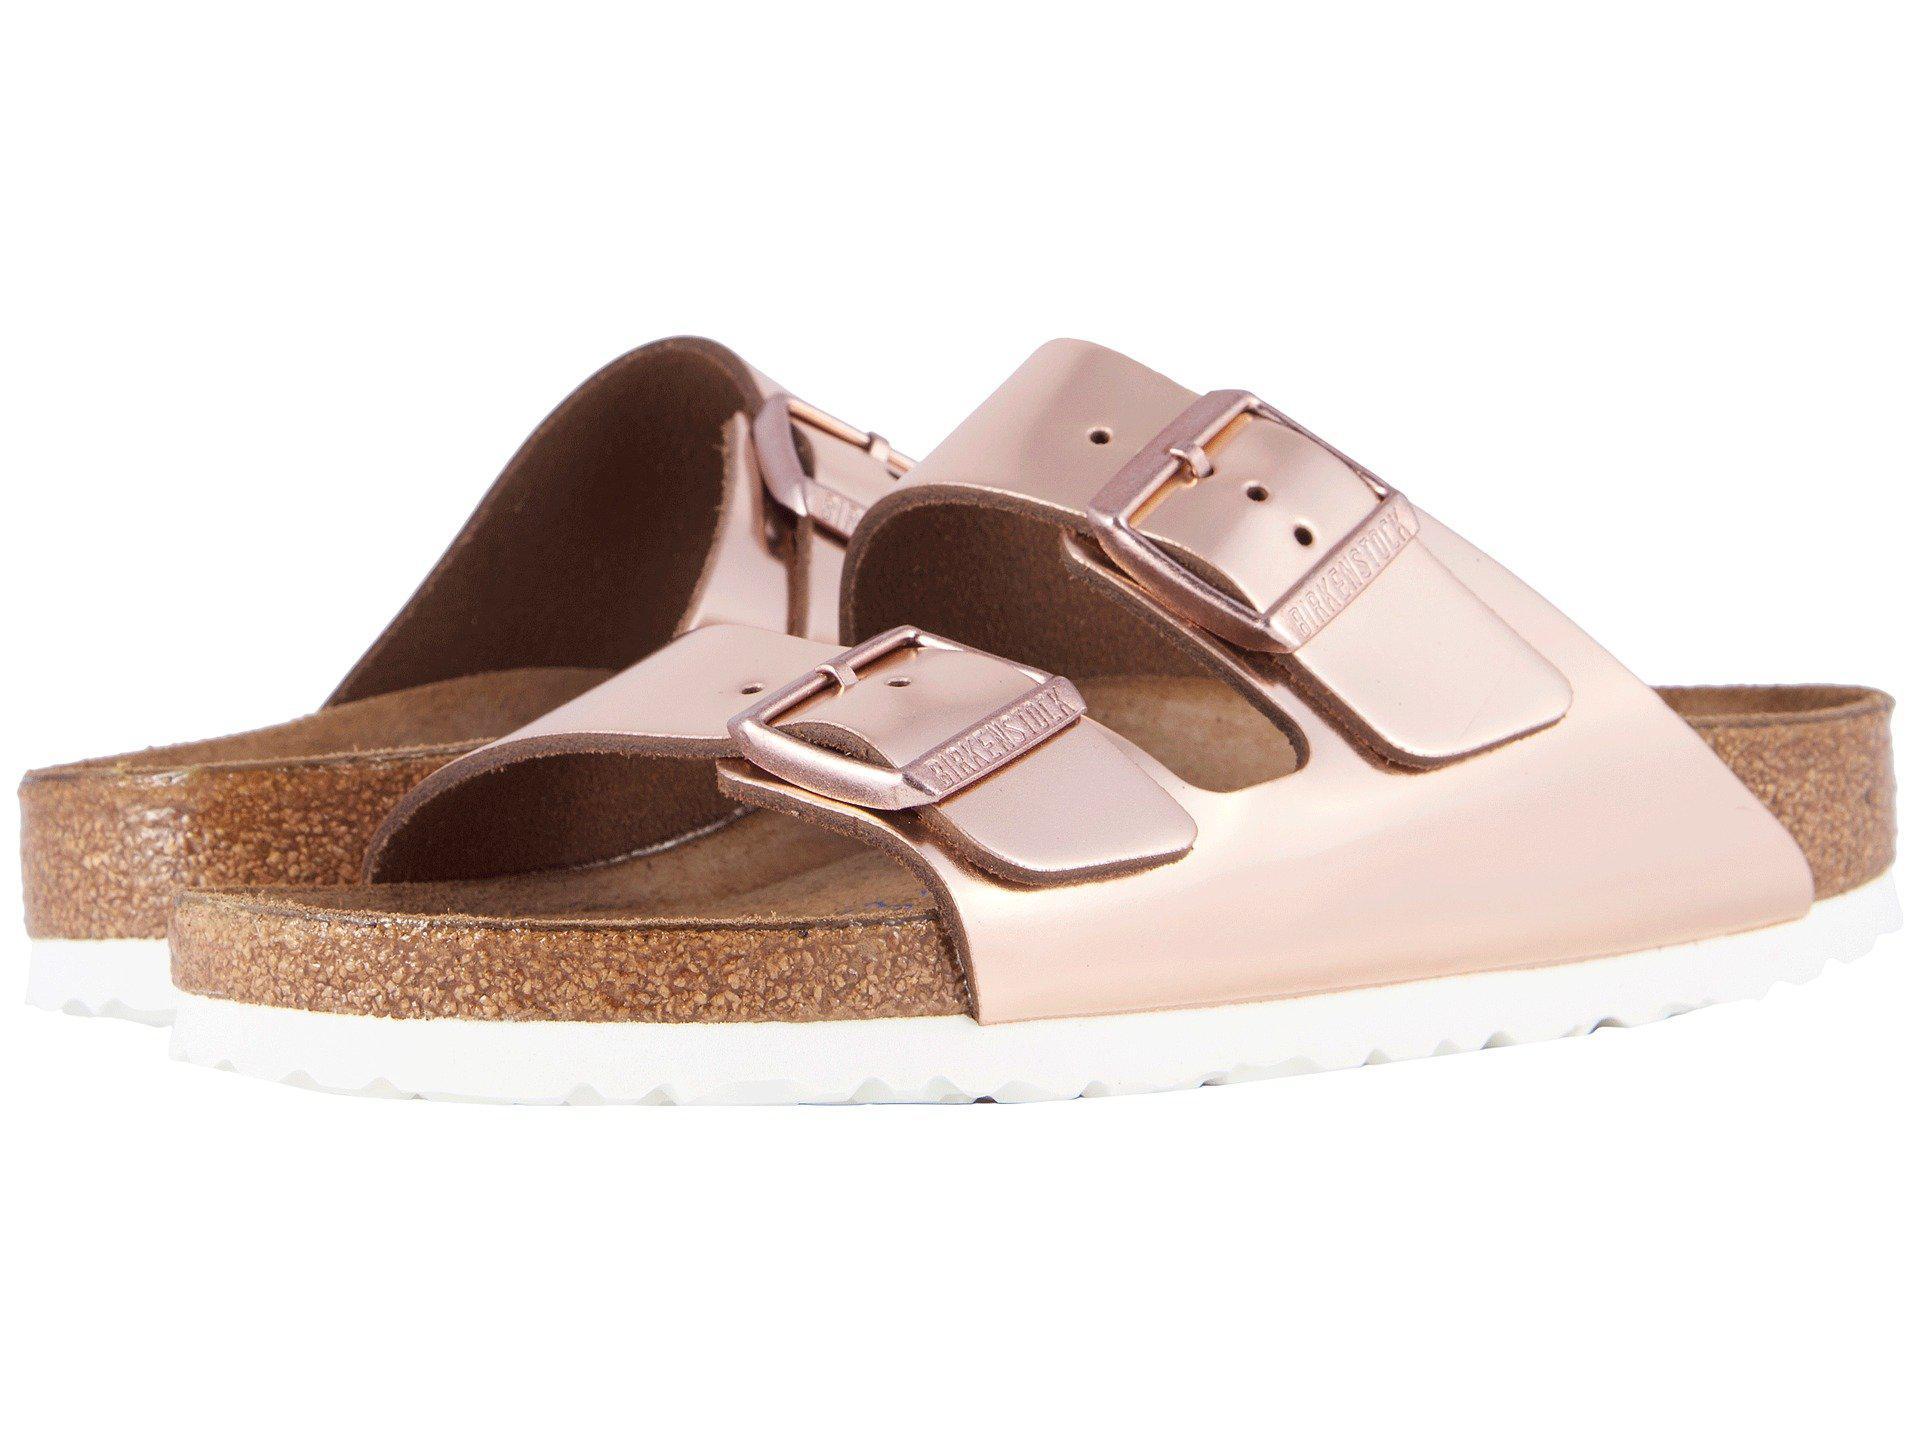 d64275a06752 Lyst - Birkenstock Arizona Soft Footbed (copper Leather) Women s ...